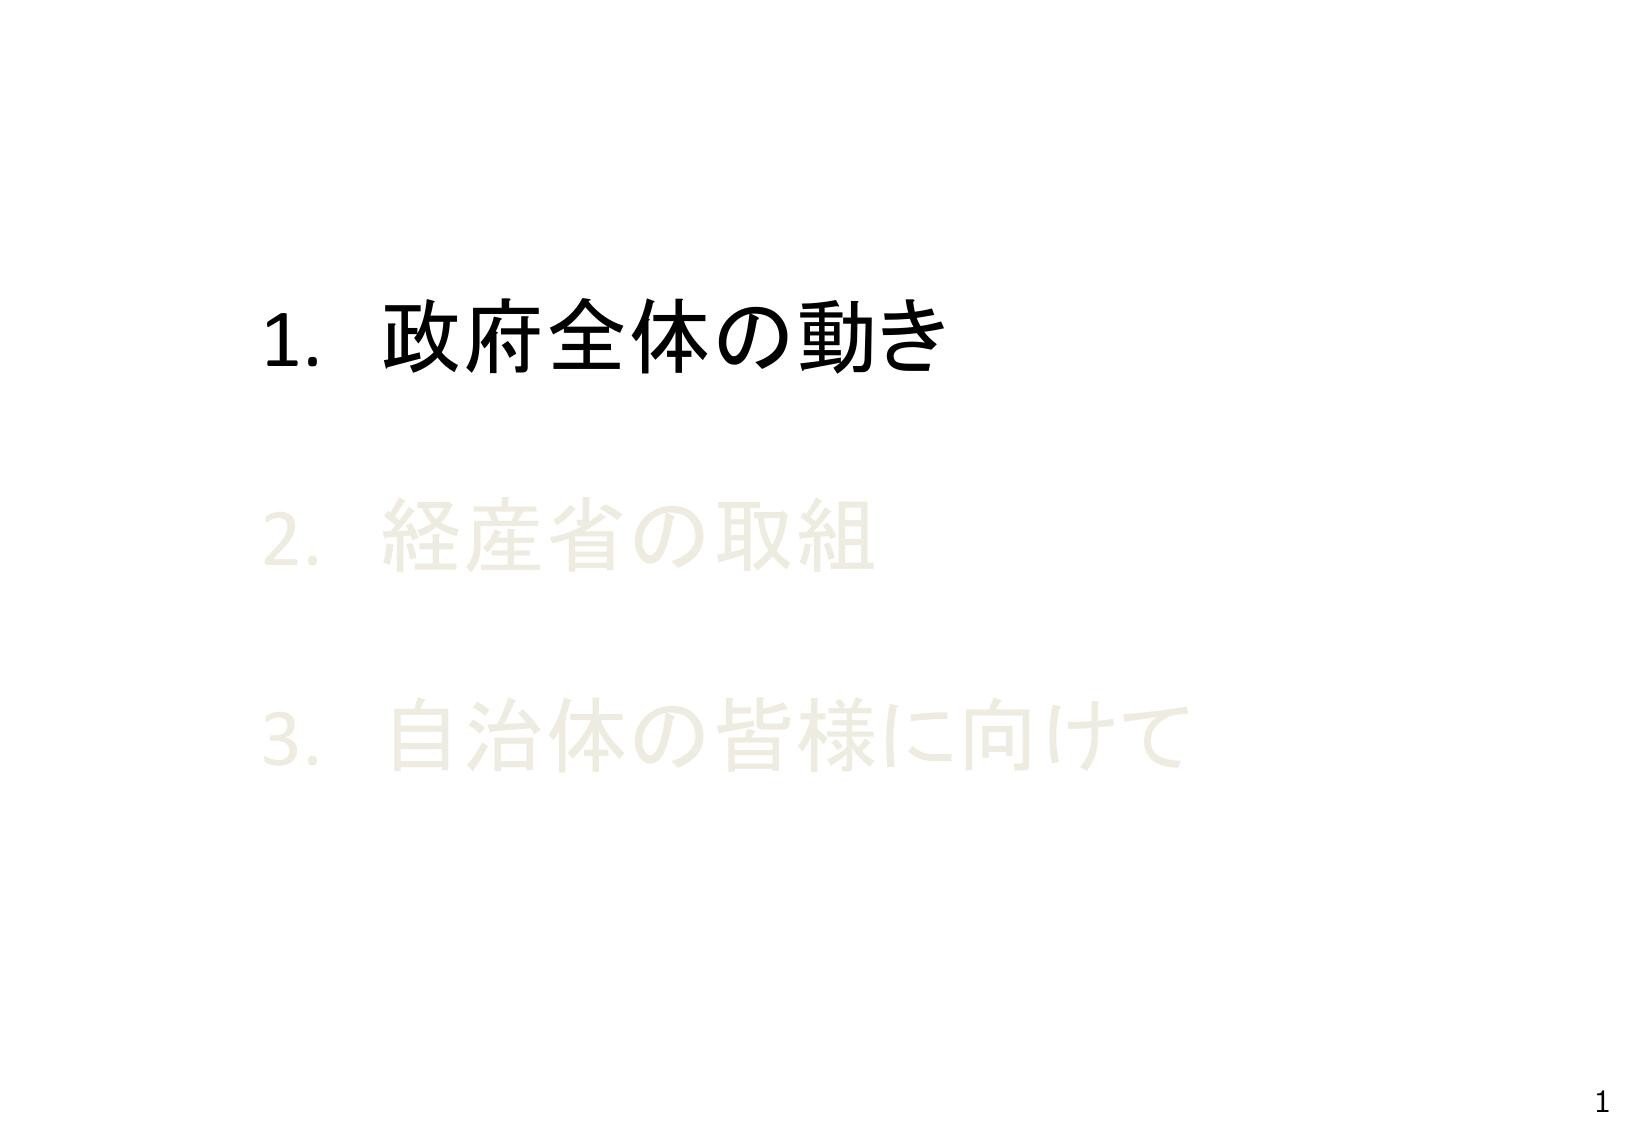 f:id:chayarokurokuro:20210408030332j:plain